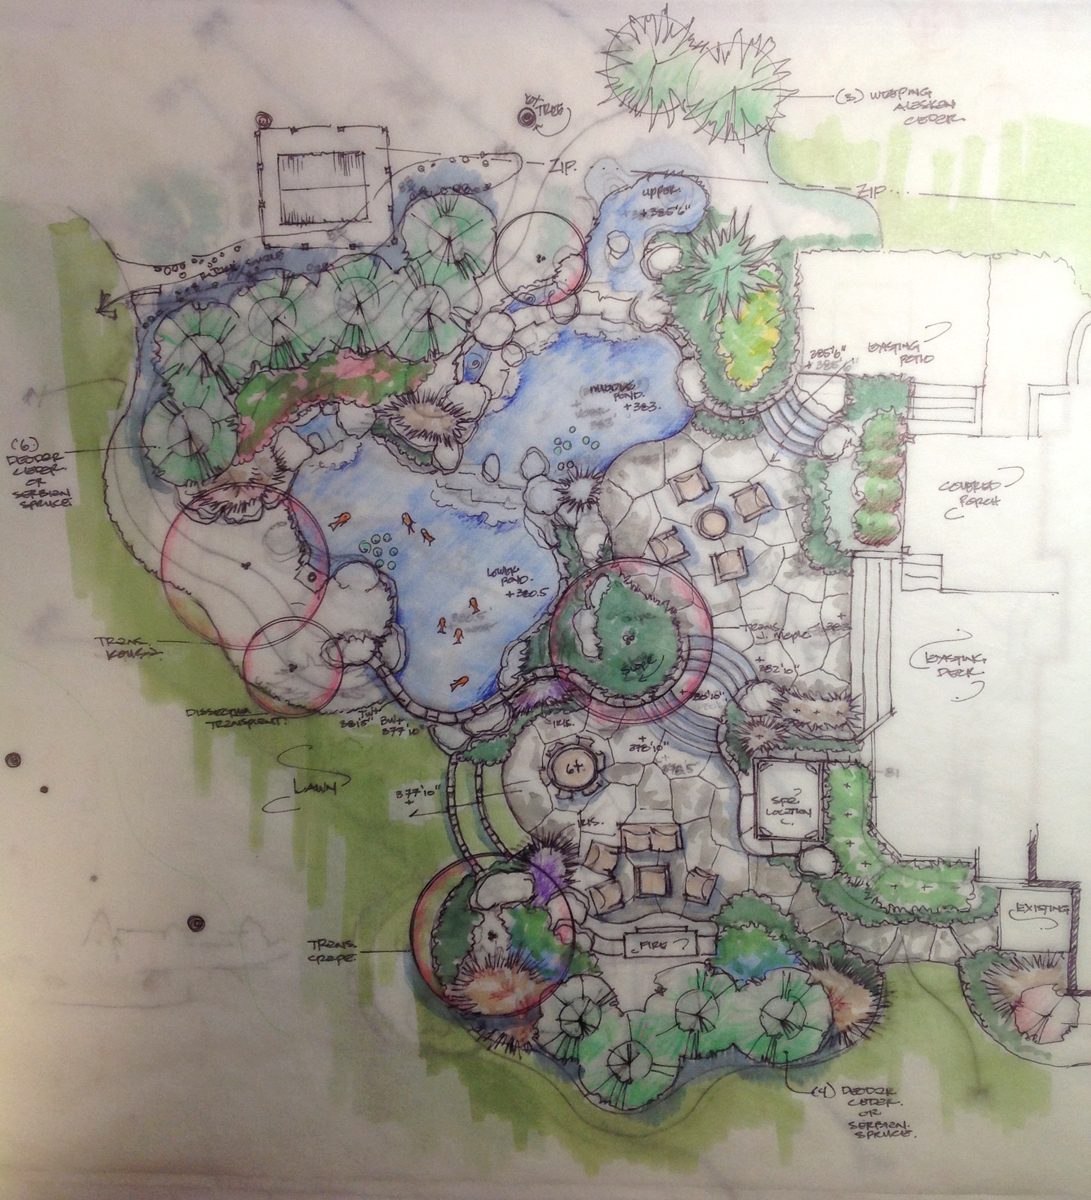 Waterfall koi pond design in vienna virginia surrounds for Pond design plans